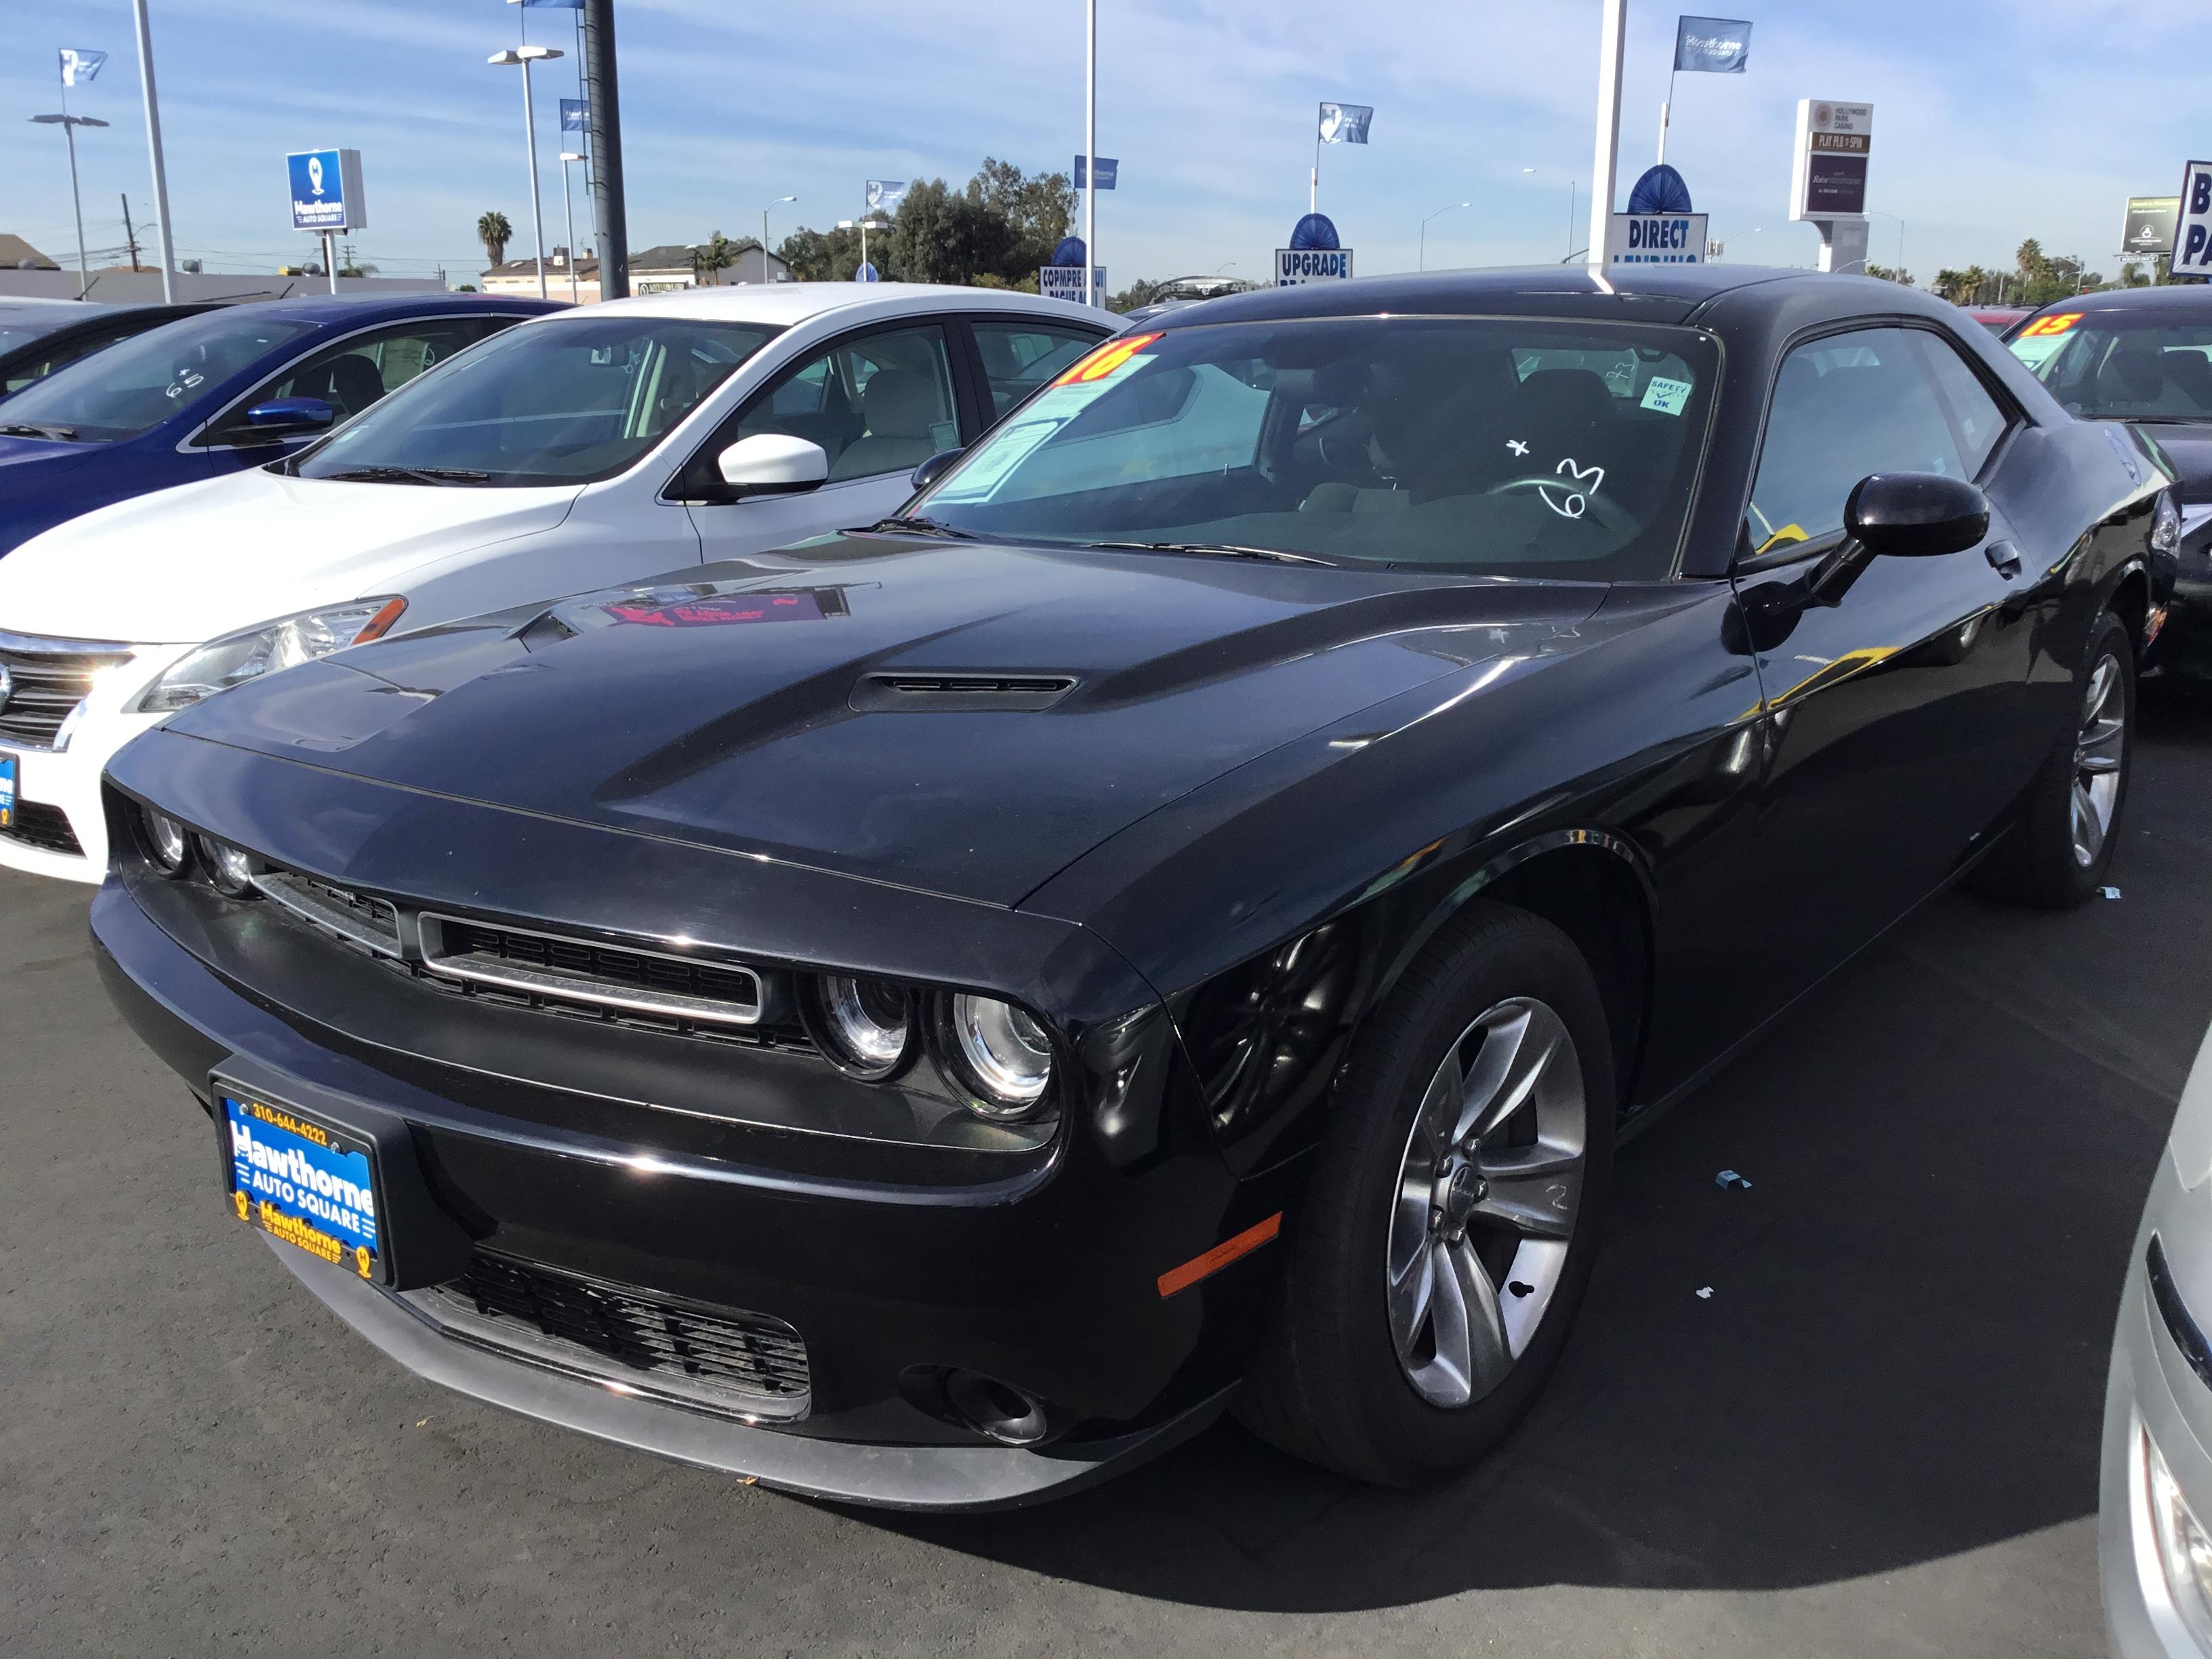 2016 Dodge Challenger Hawthorne Auto Square